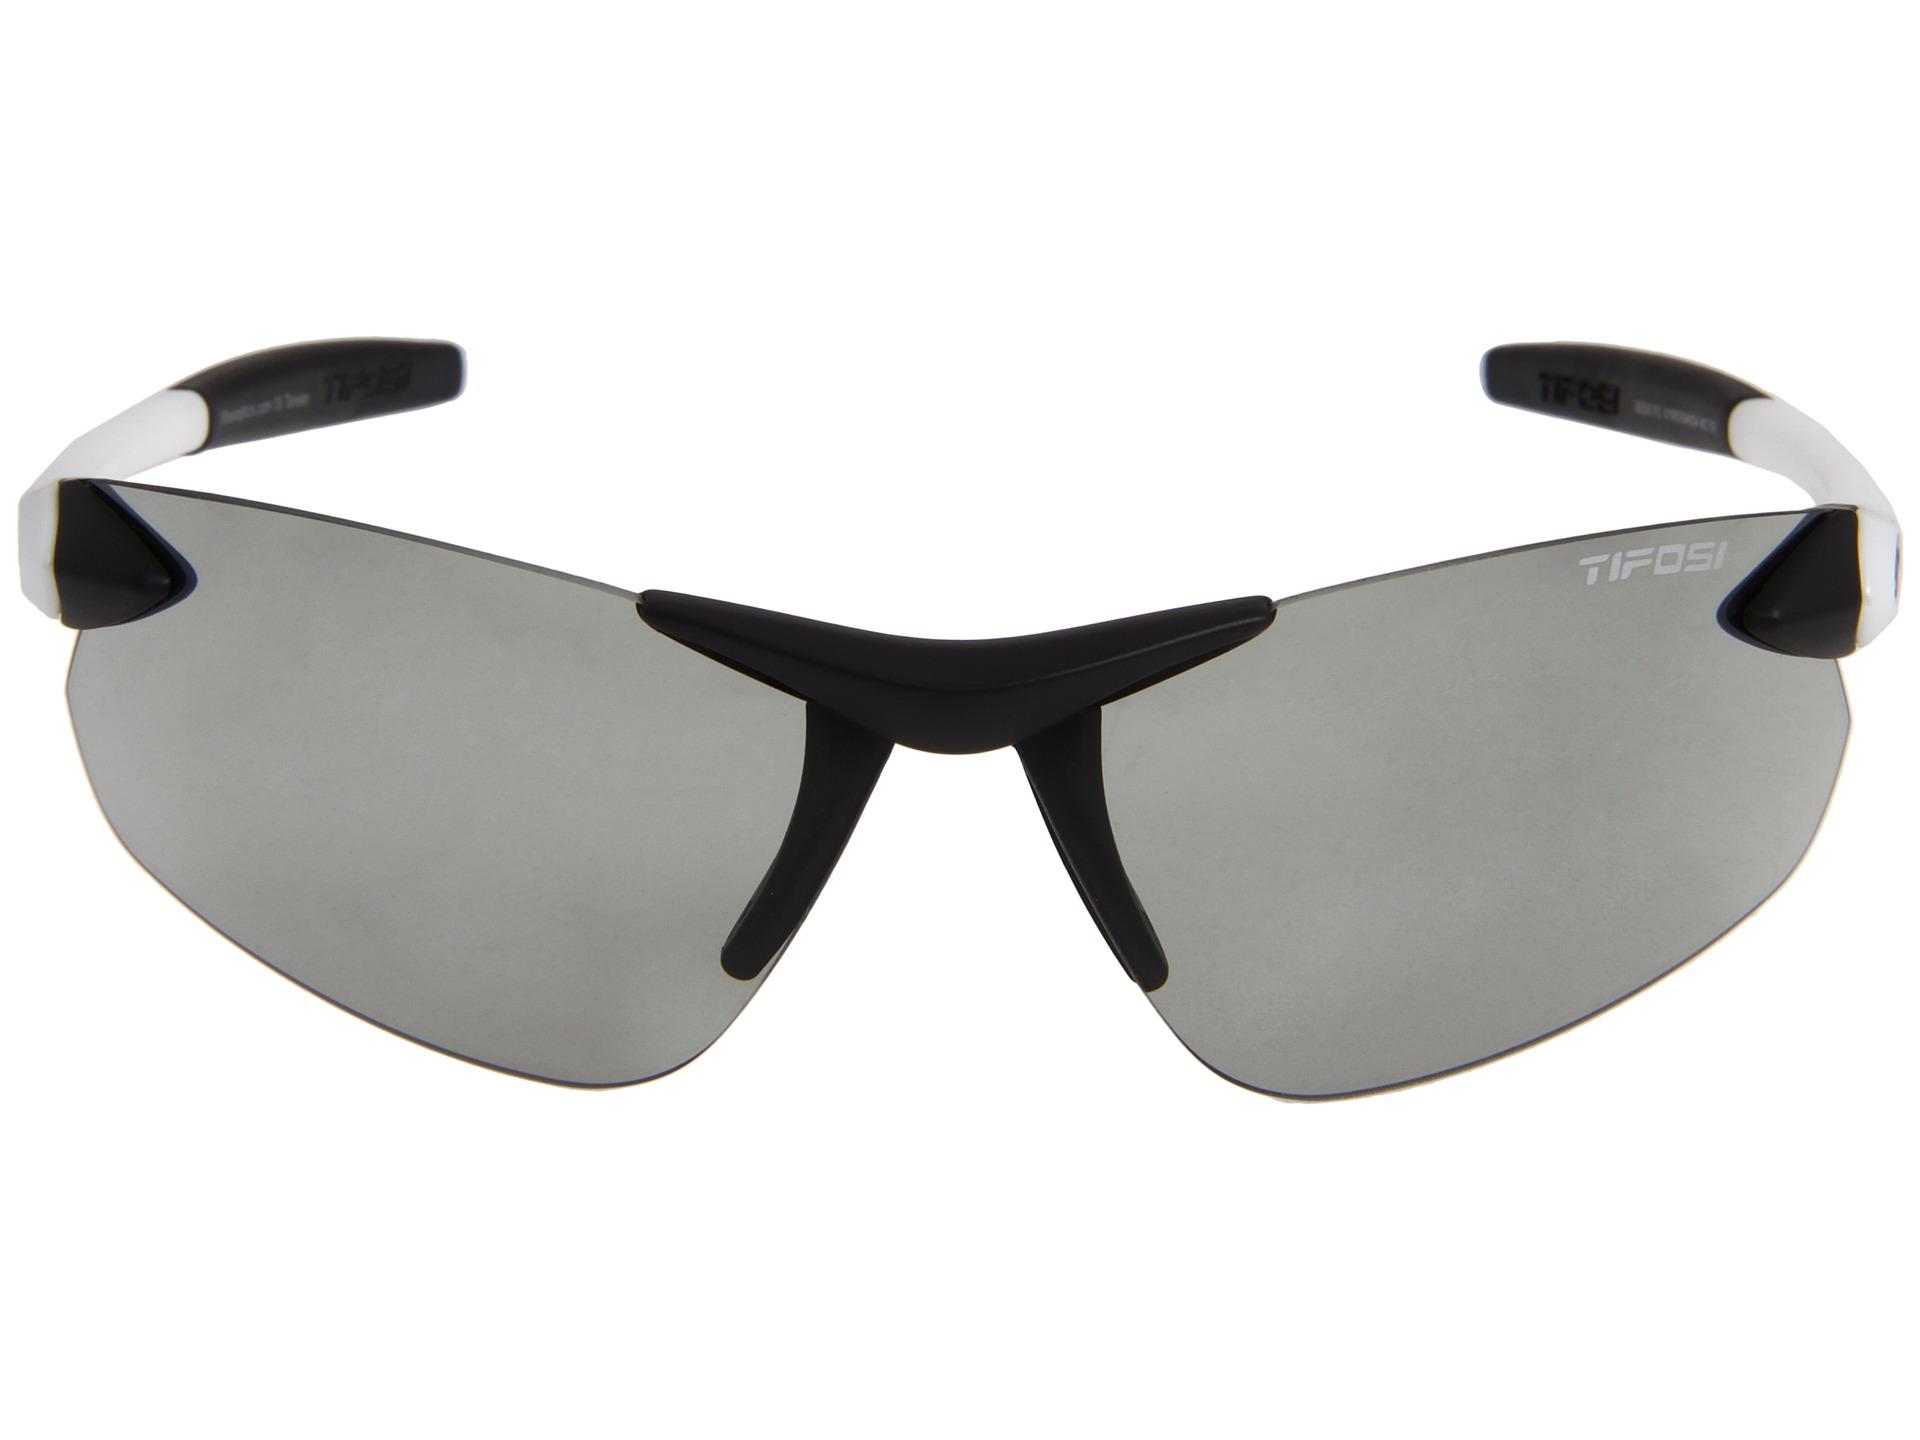 96e09a9f03 Tifosi Seek Fc Photochromic Sunglasses Review